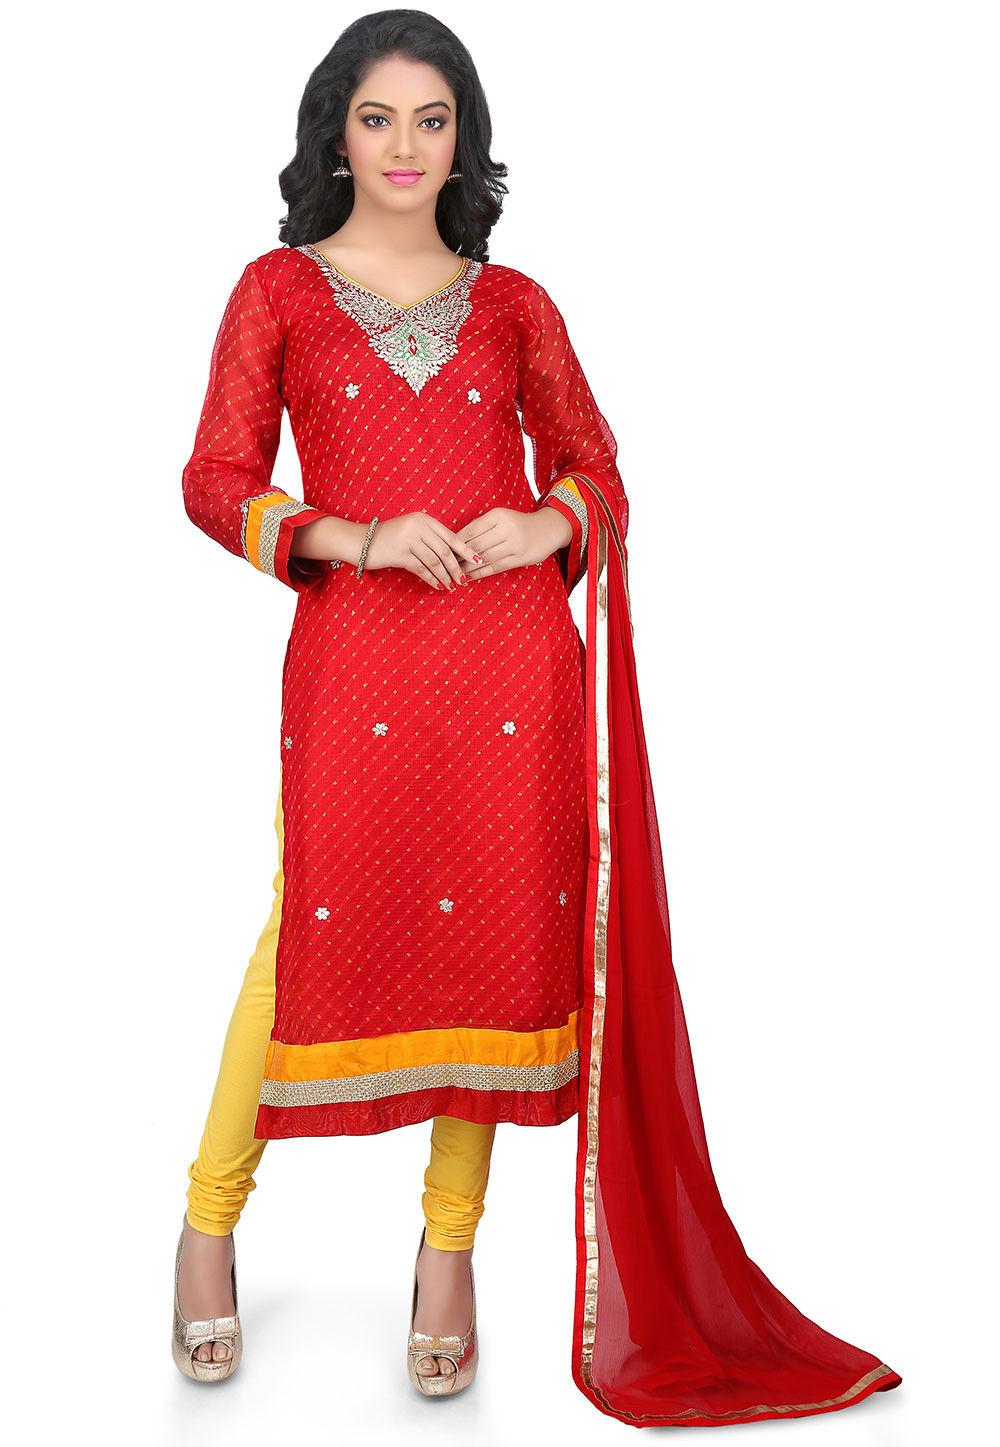 Leheriya Pure Kota Silk Straight Cut Suit in Red